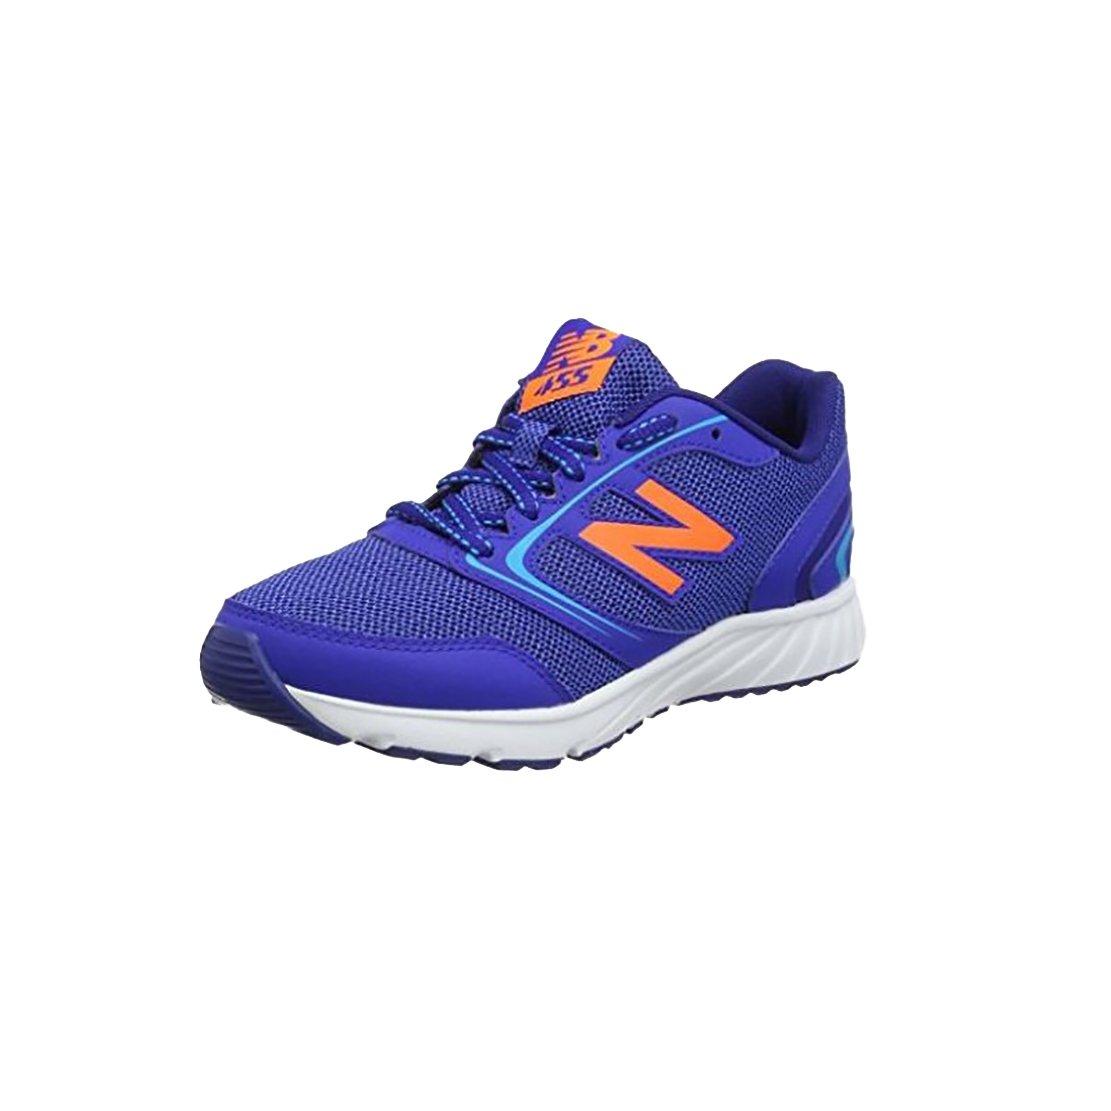 New Balance Zapatillas Kj455pdy Royal, Scarpe da Fitness